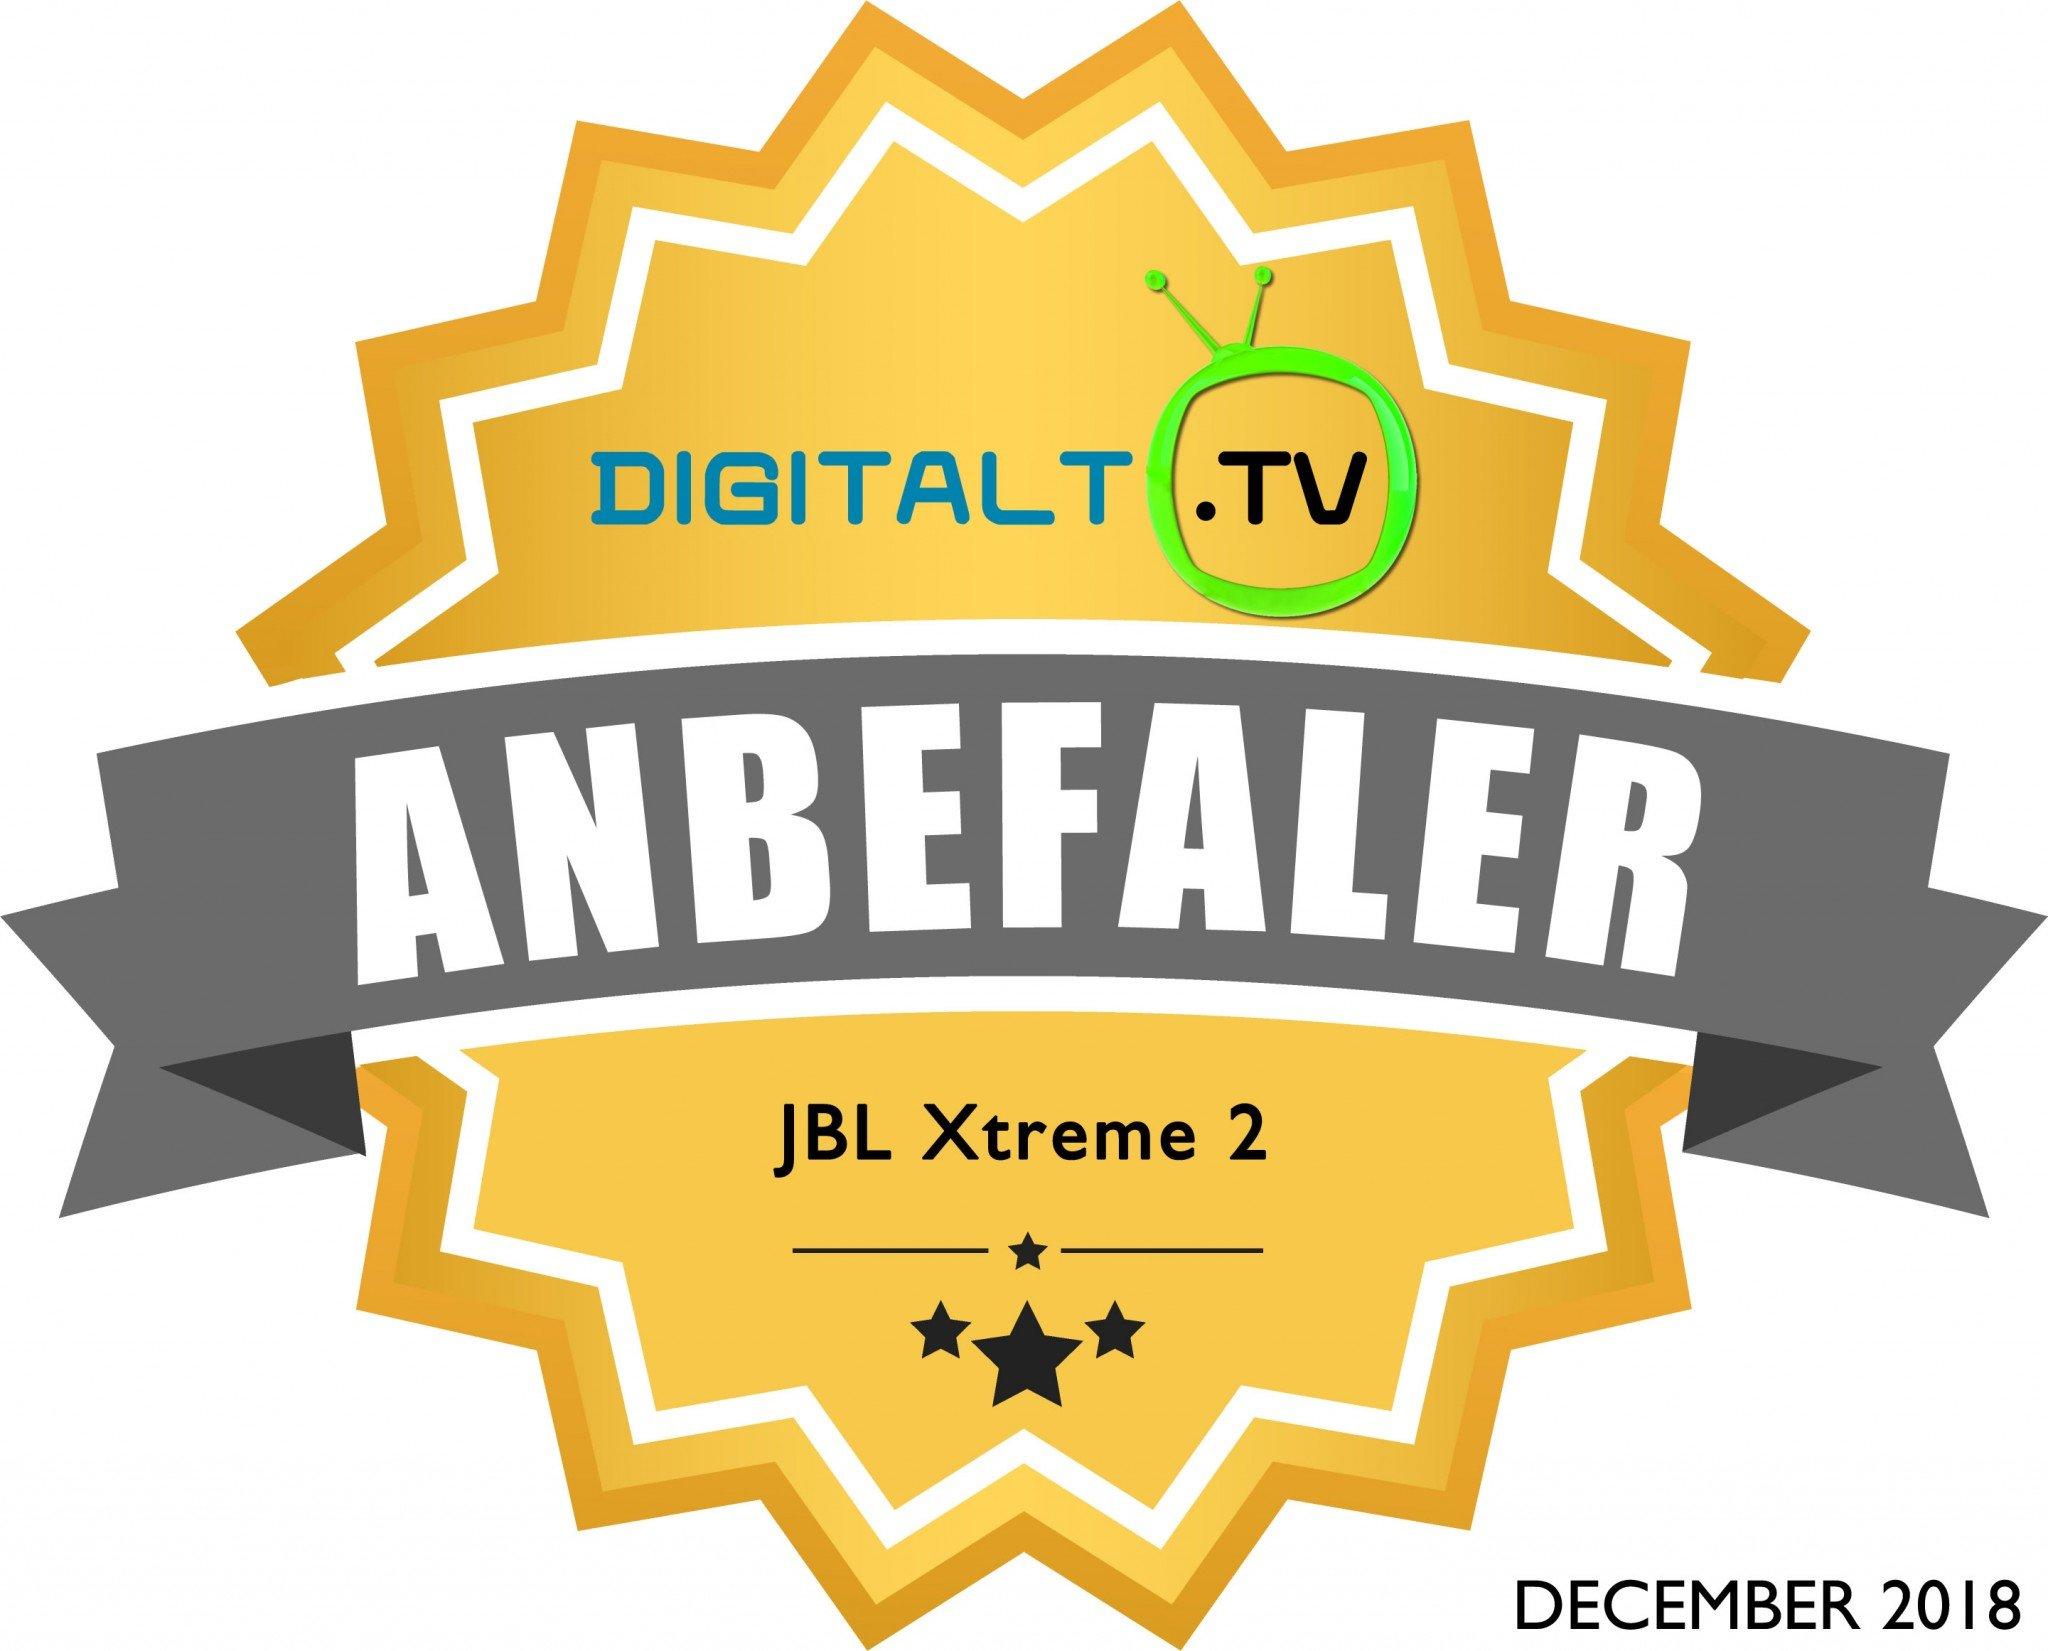 JBL Xtreme 2 Logo anbefaling